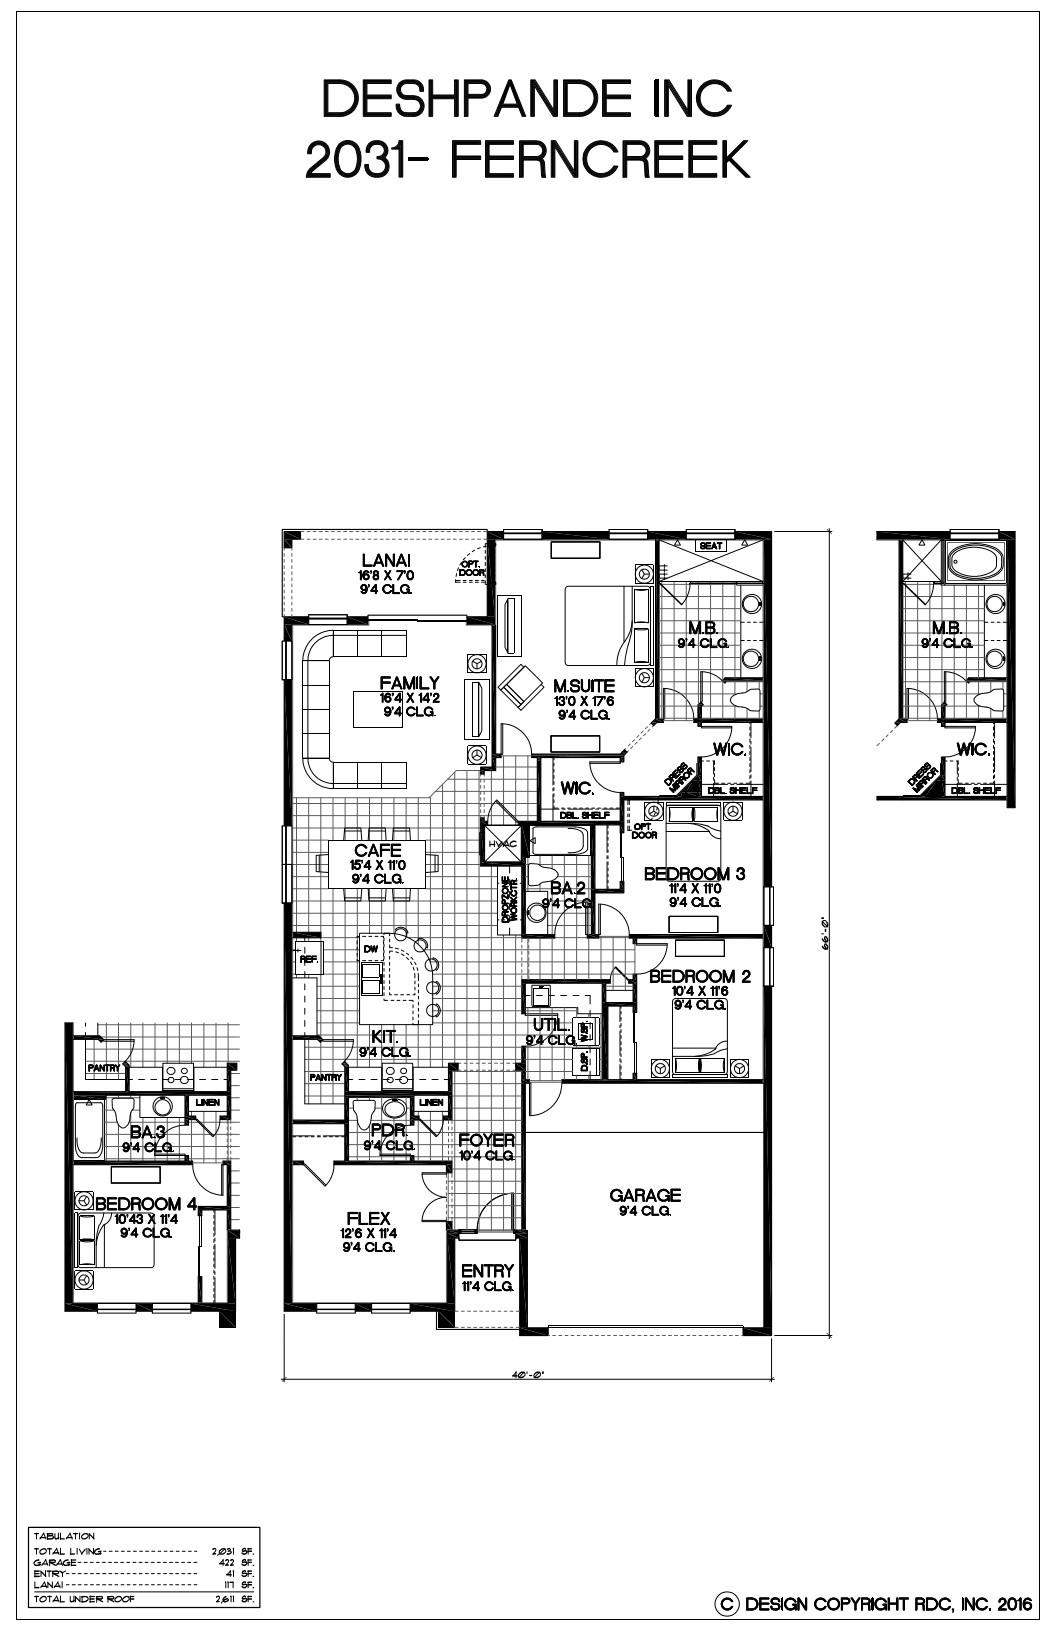 Ferncreek-2031-Floor Plan